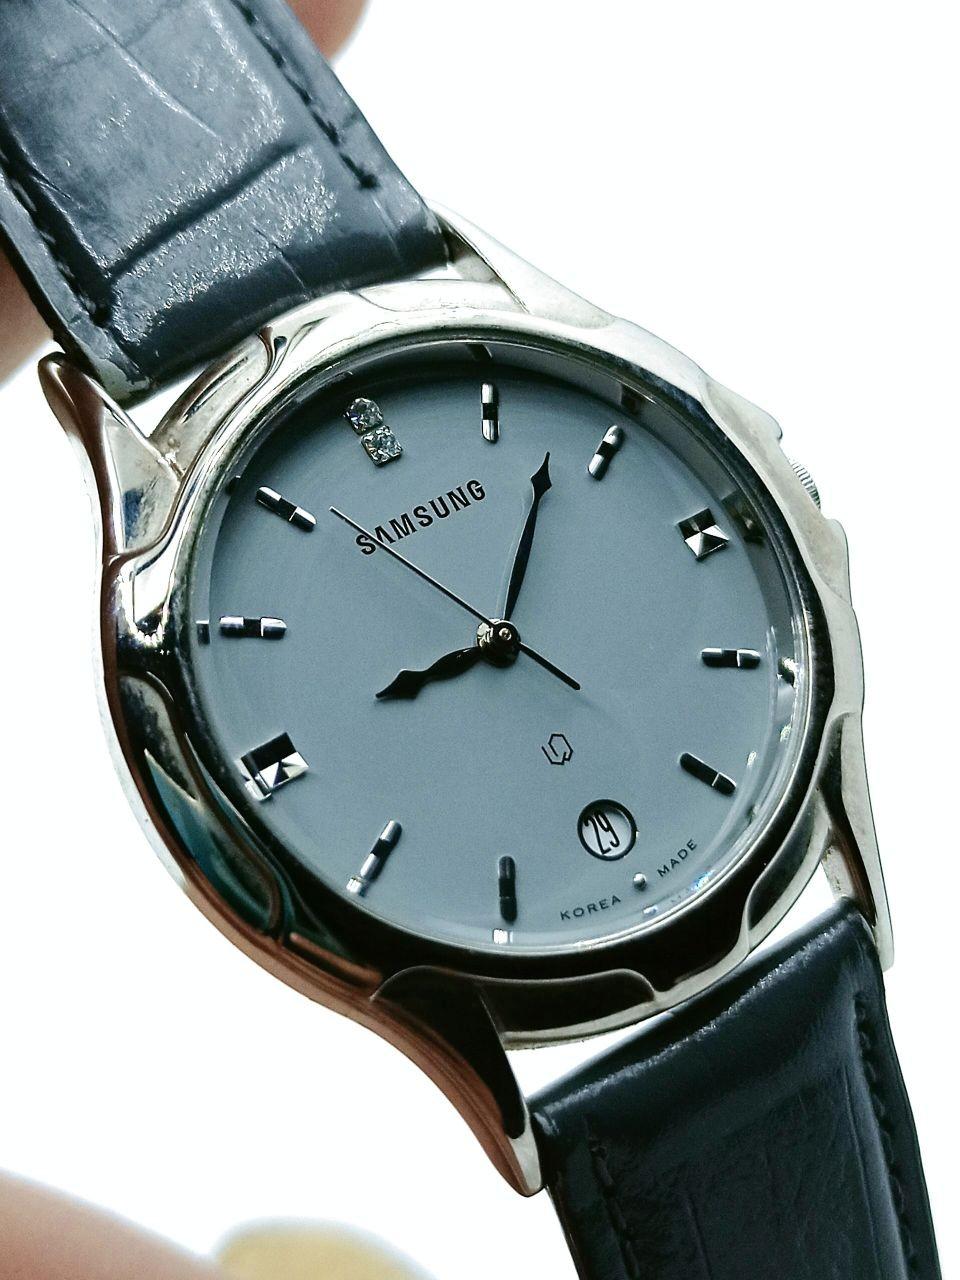 Samsung ba0305 watch